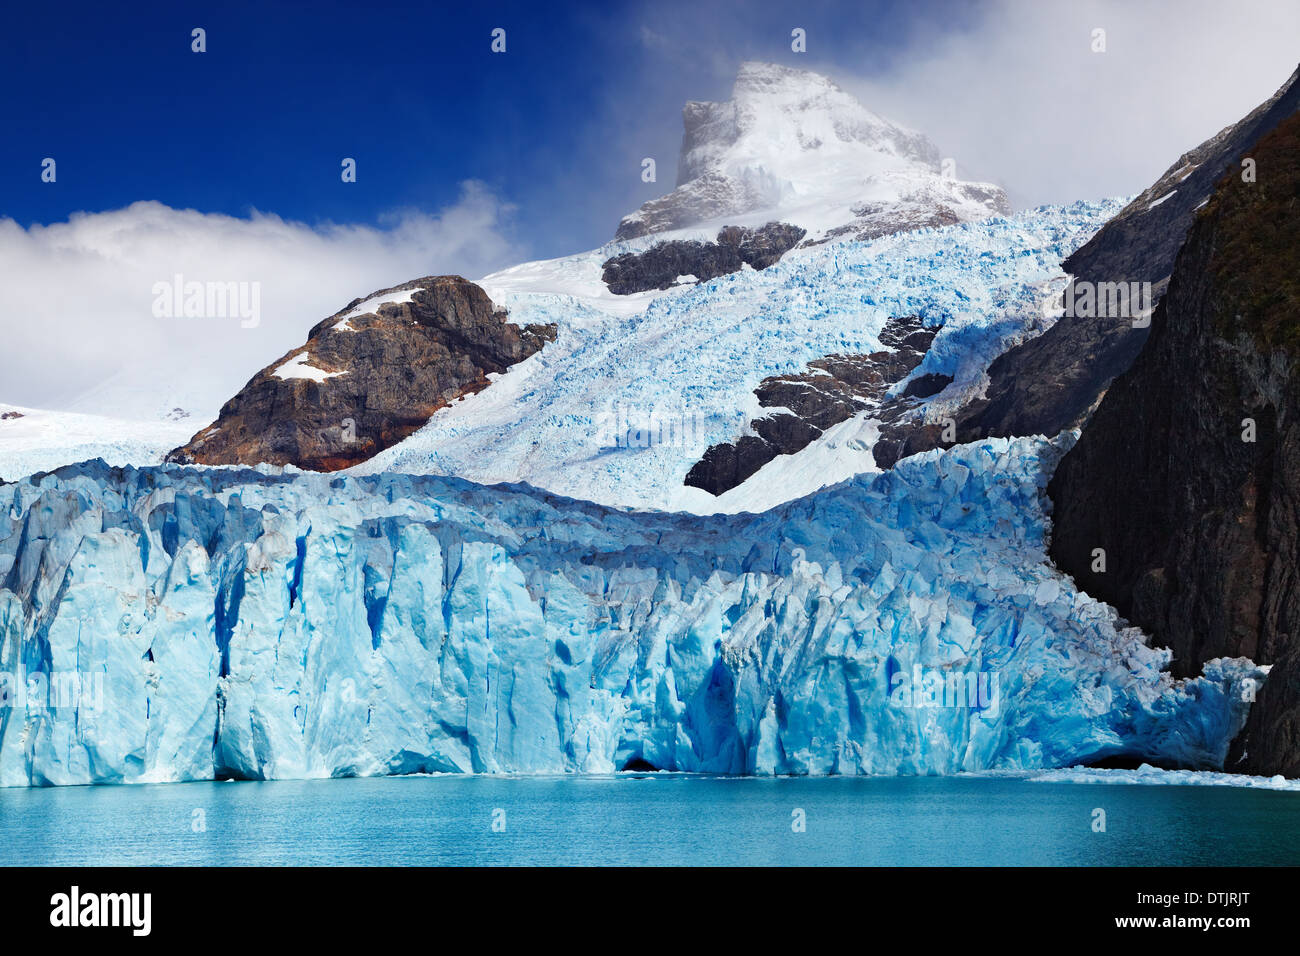 Il Ghiacciaio Spegazzini, Lago Argentino, Patagonia, Argentina Immagini Stock